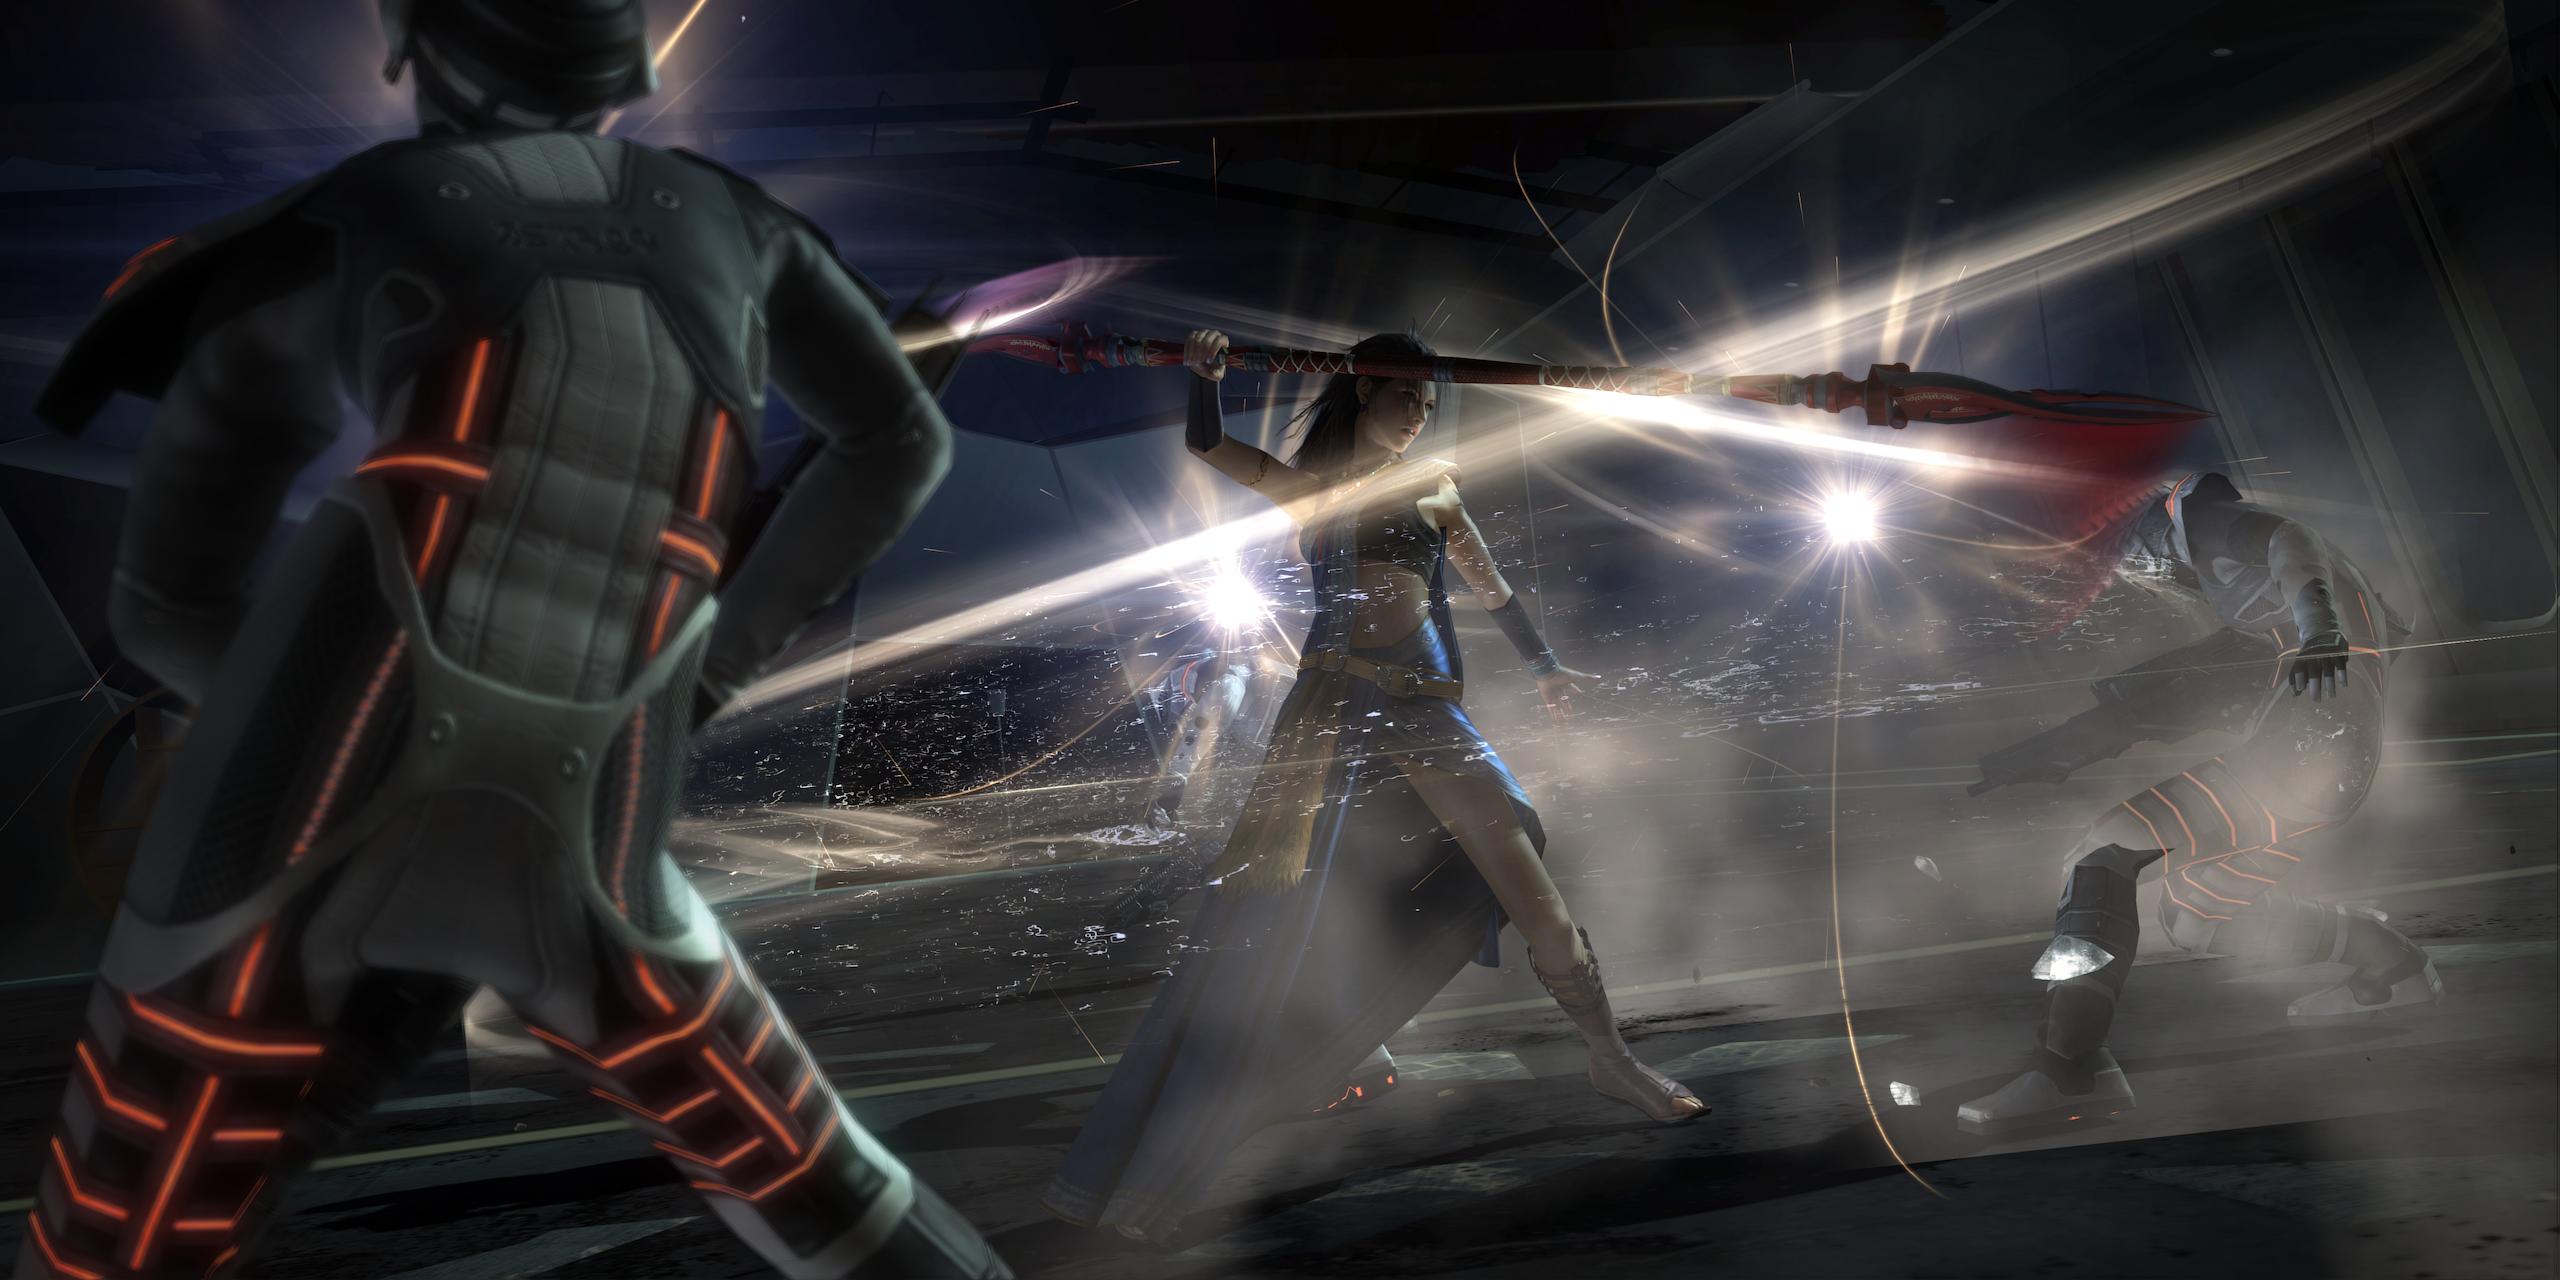 Final Fantasy XIII abilities